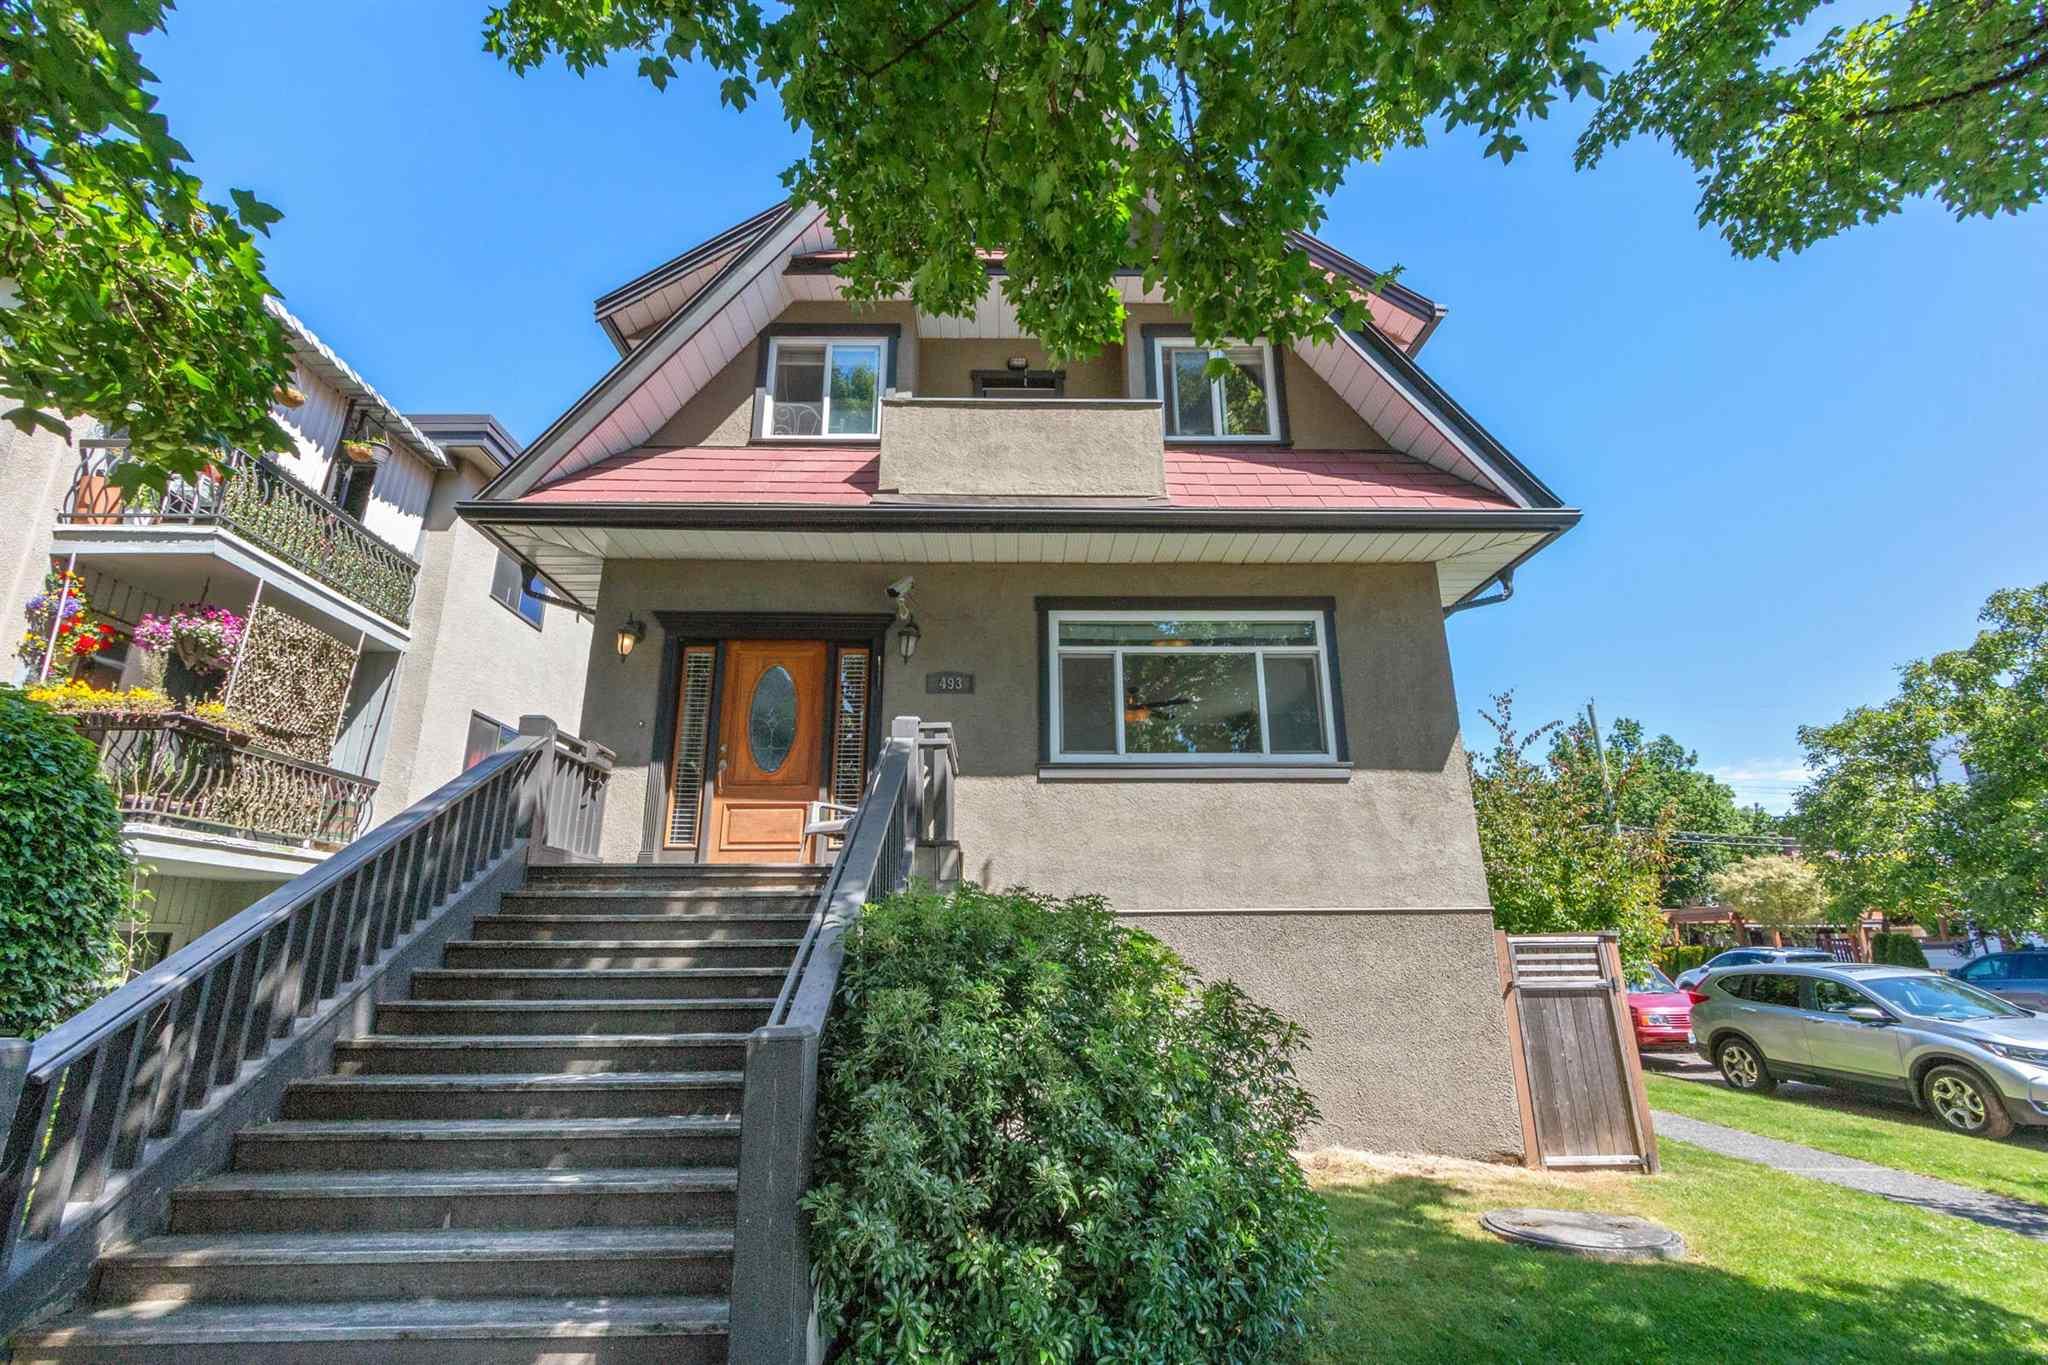 493 E 44TH AVENUE - Fraser VE House/Single Family for sale, 6 Bedrooms (R2617982) - #1